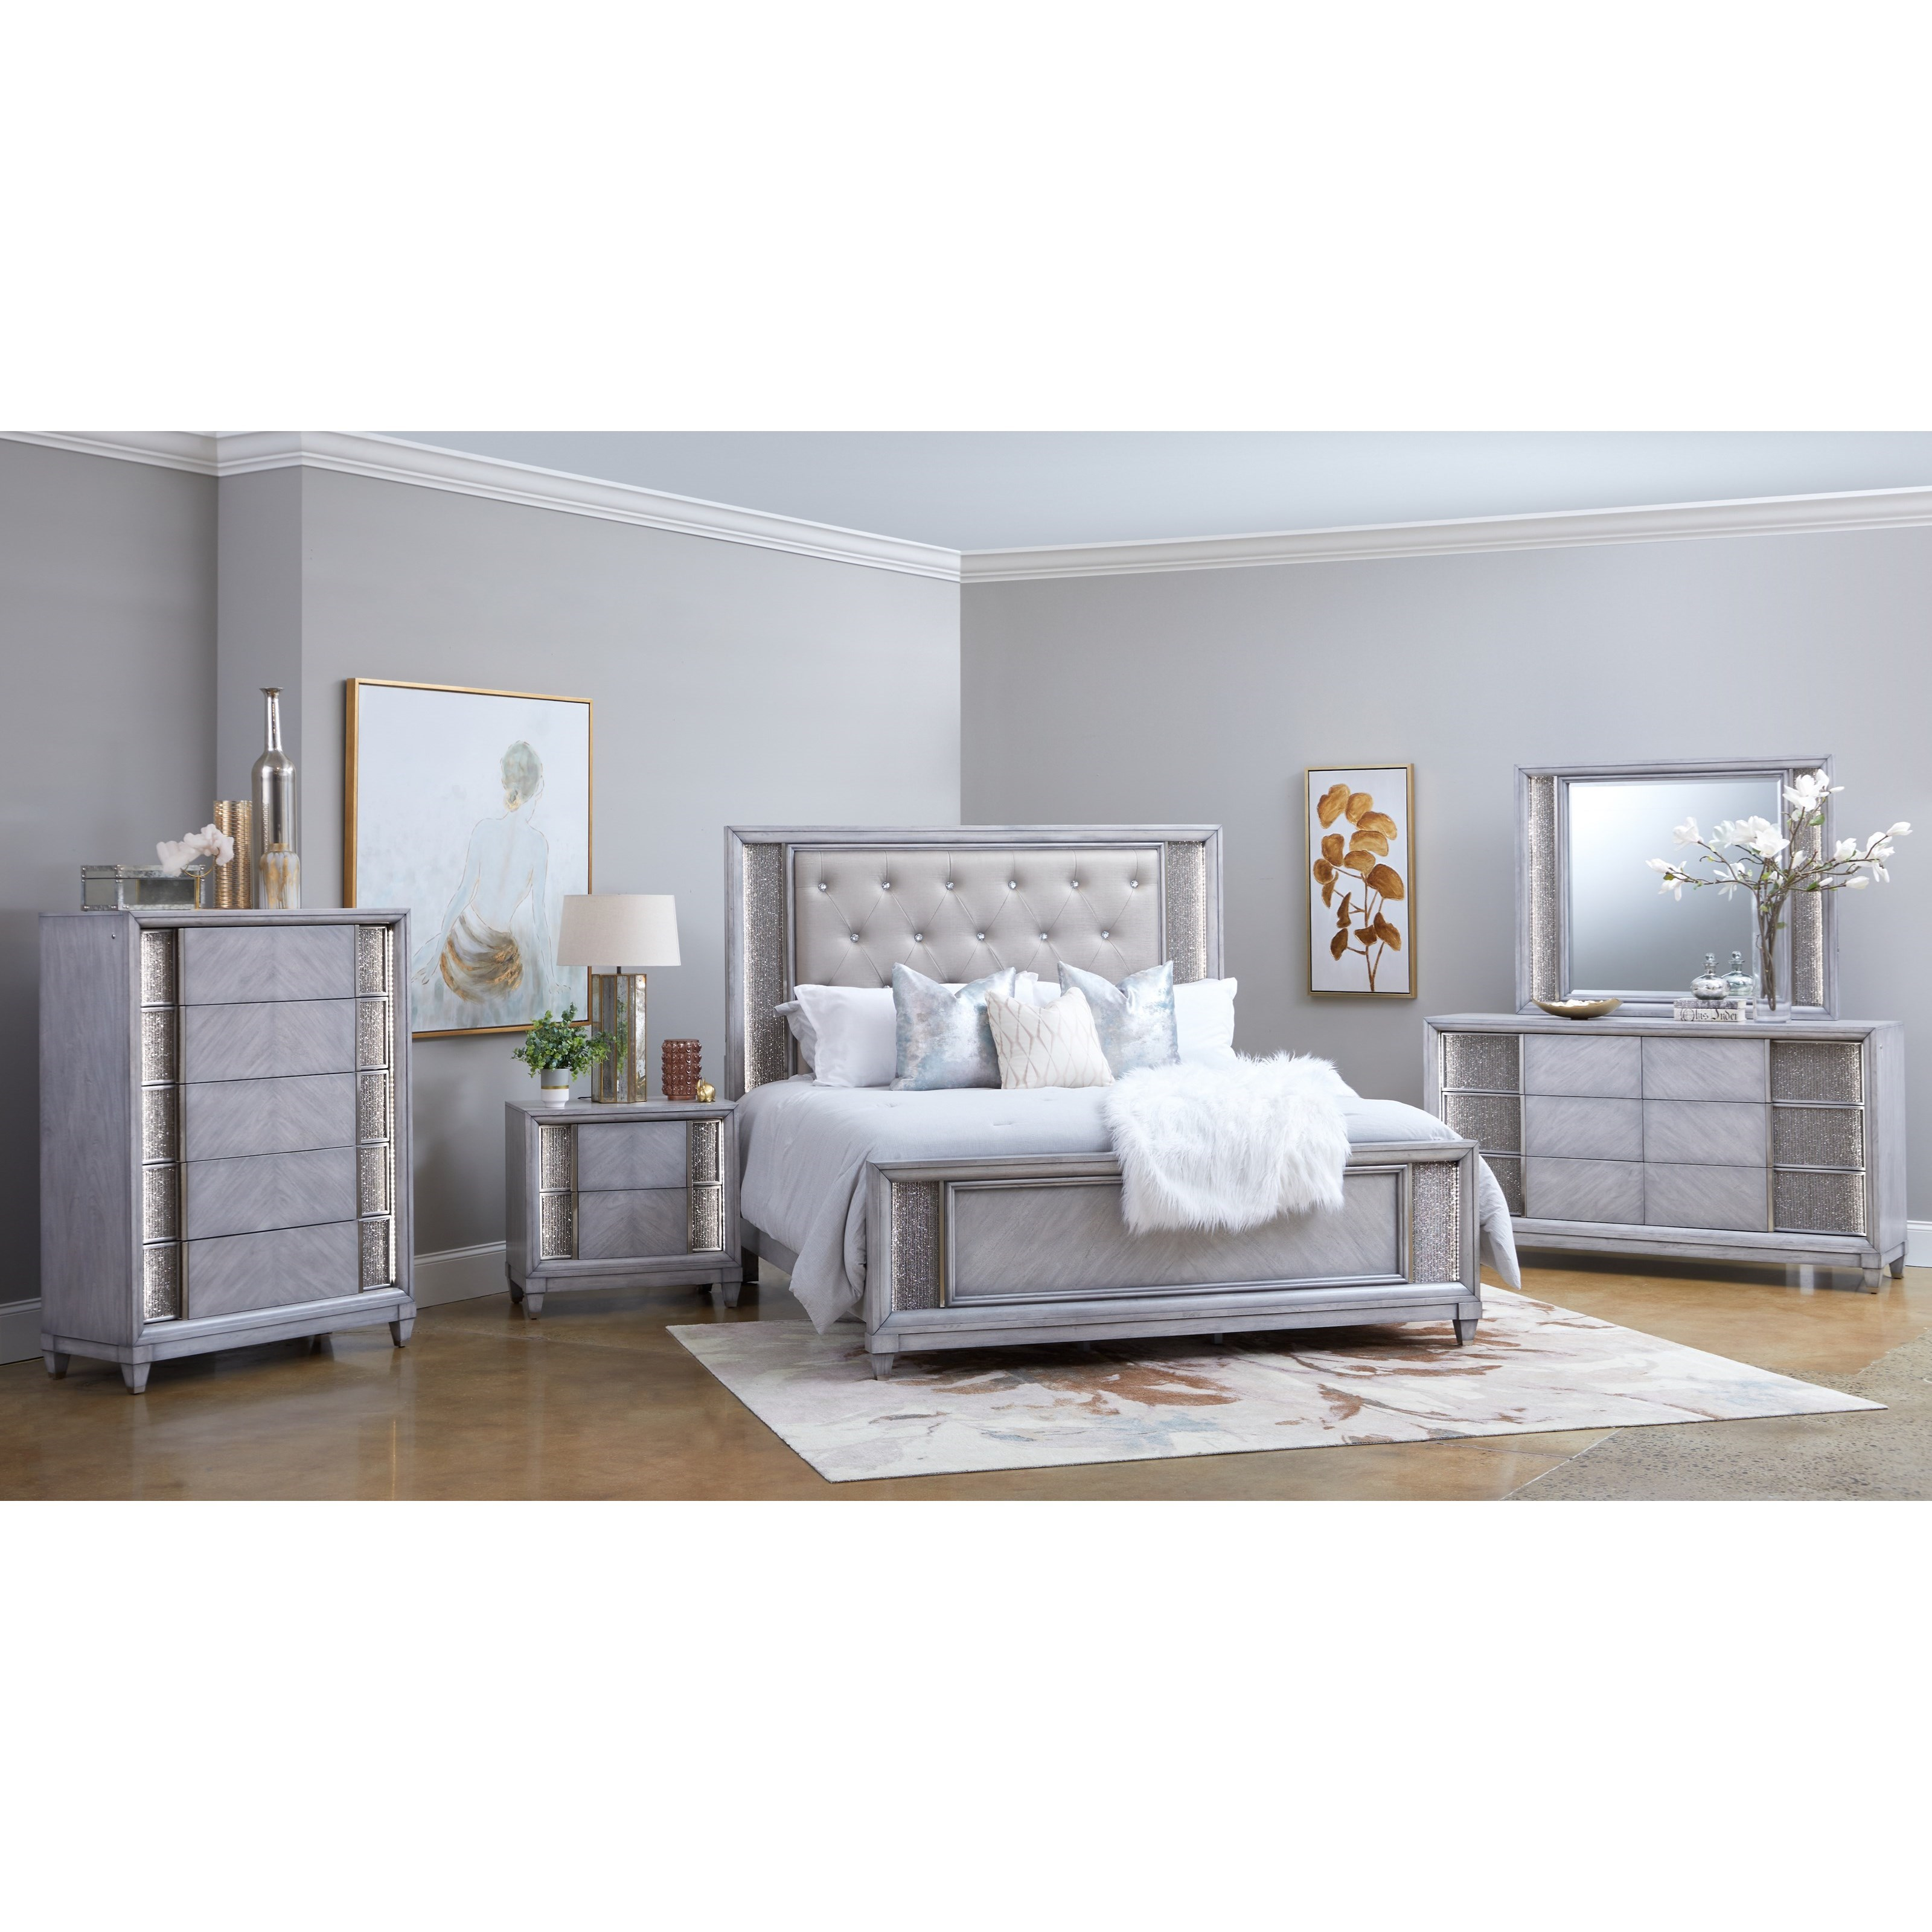 Navara Queen Bedroom Group by Klaussner International at Northeast Factory Direct